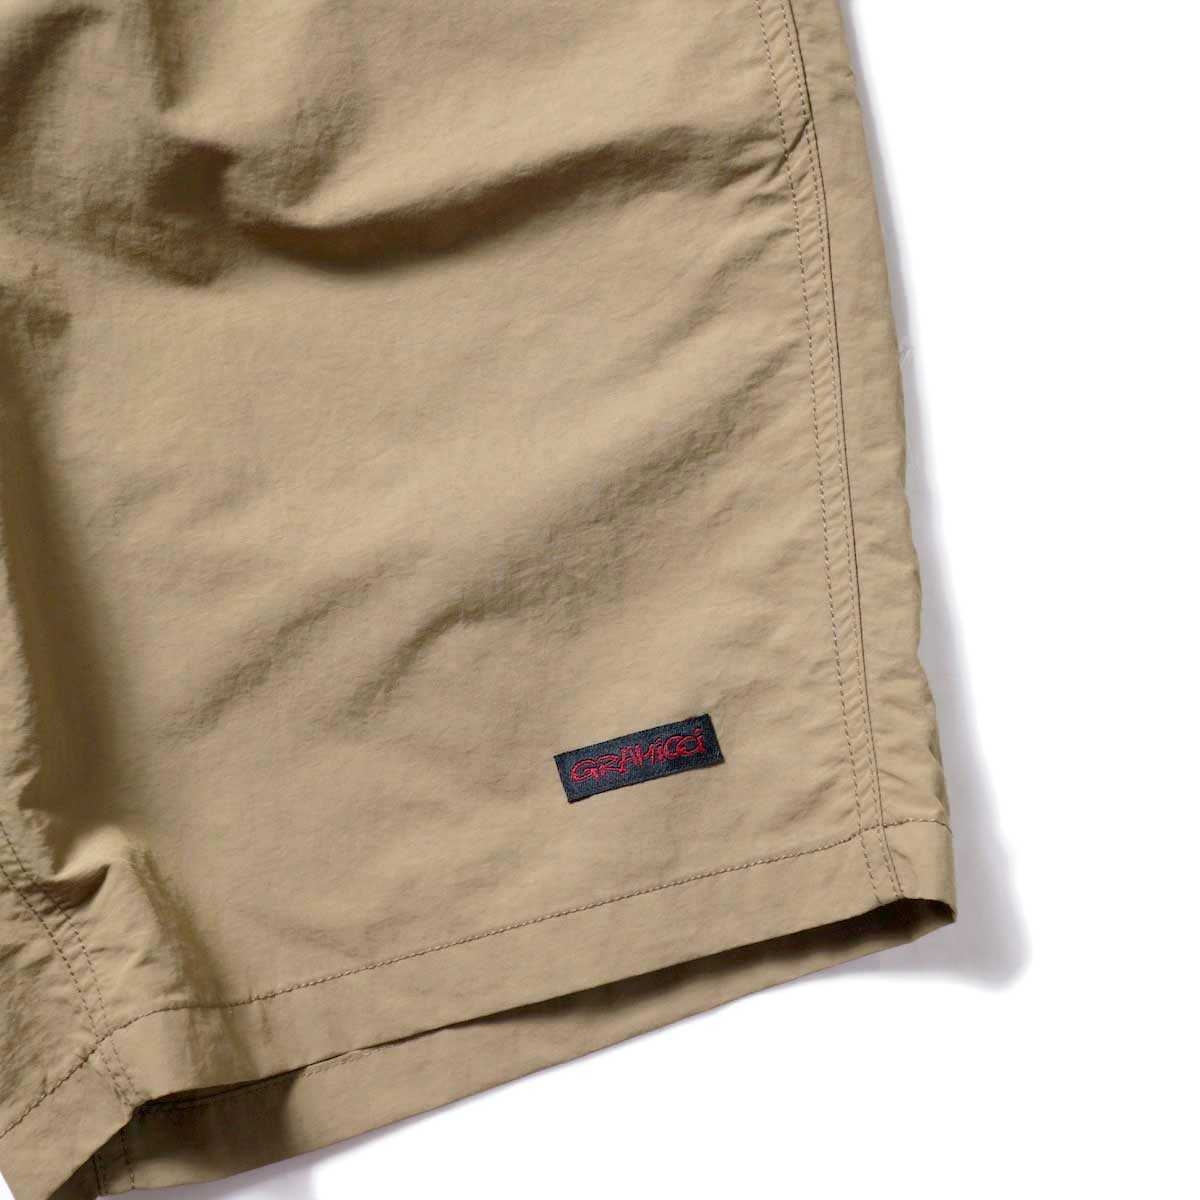 GRAMICCI / SHELL PACKABLE SHORTS (Tan)左裾ビスネーム